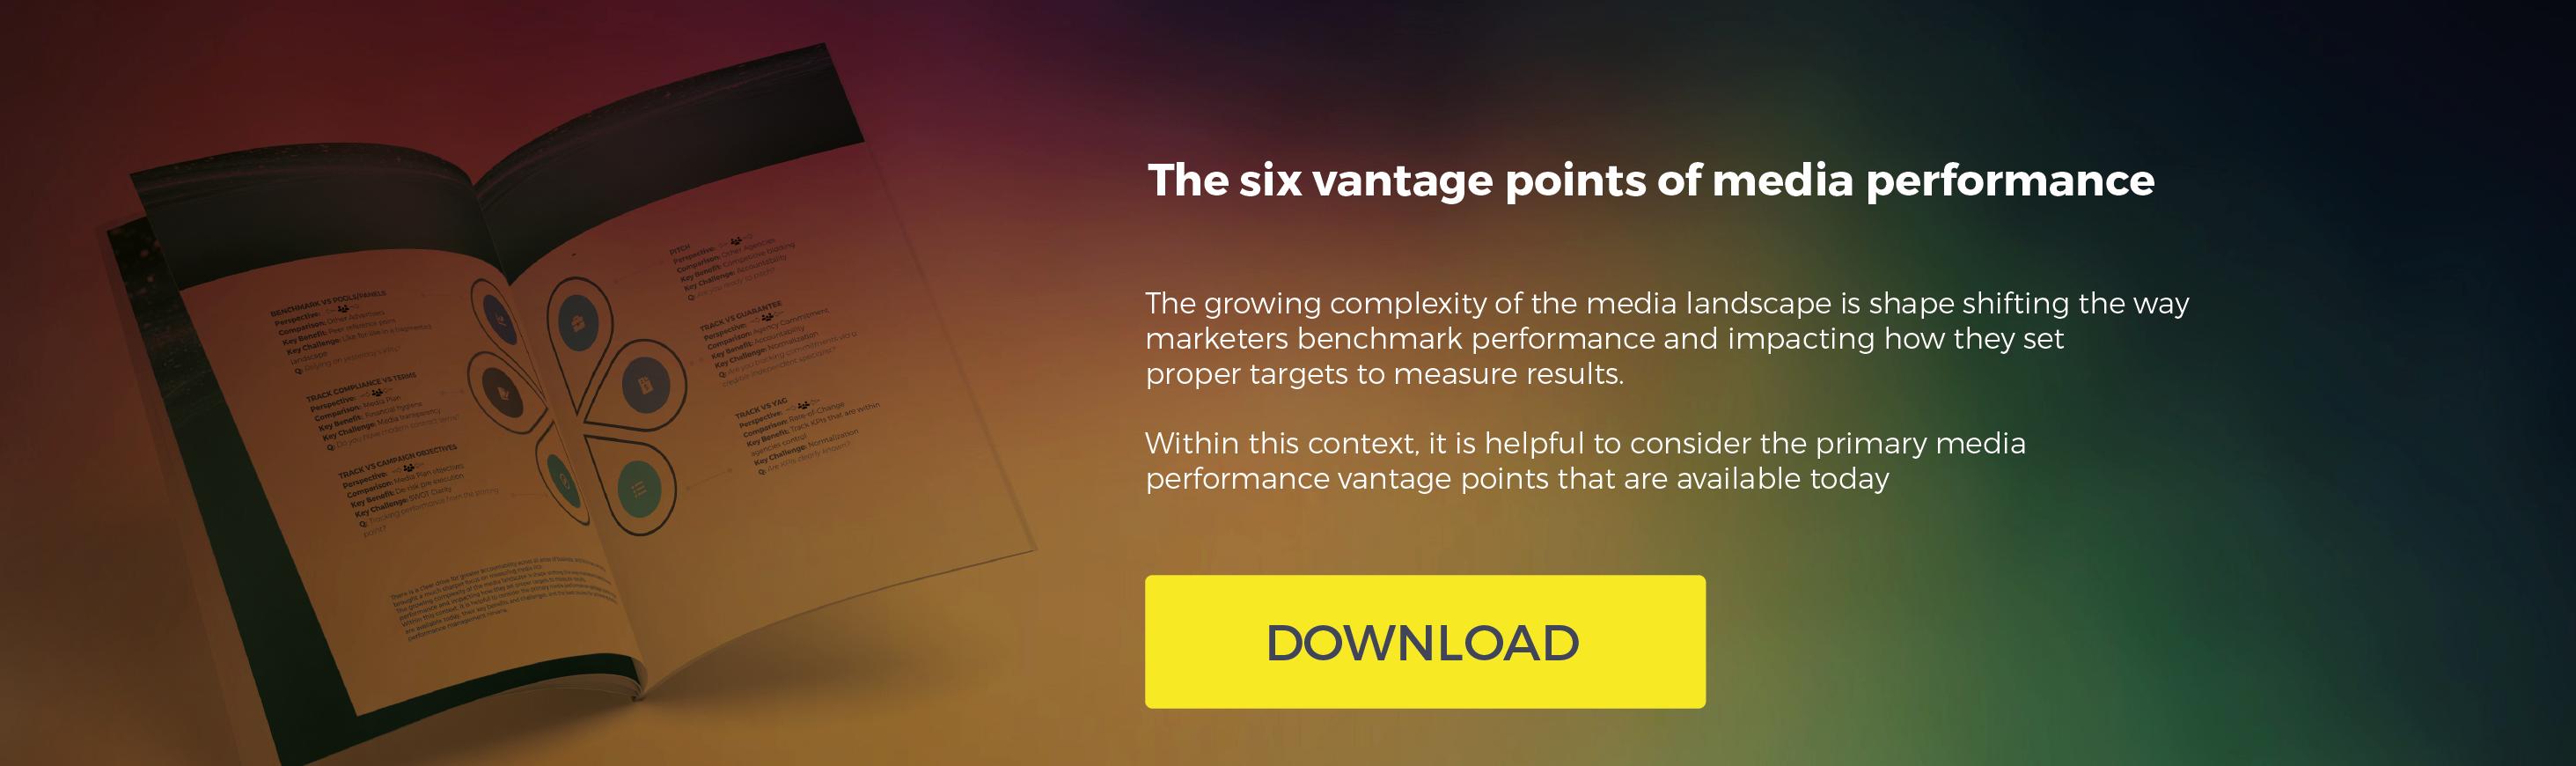 The six vantage points of media performance